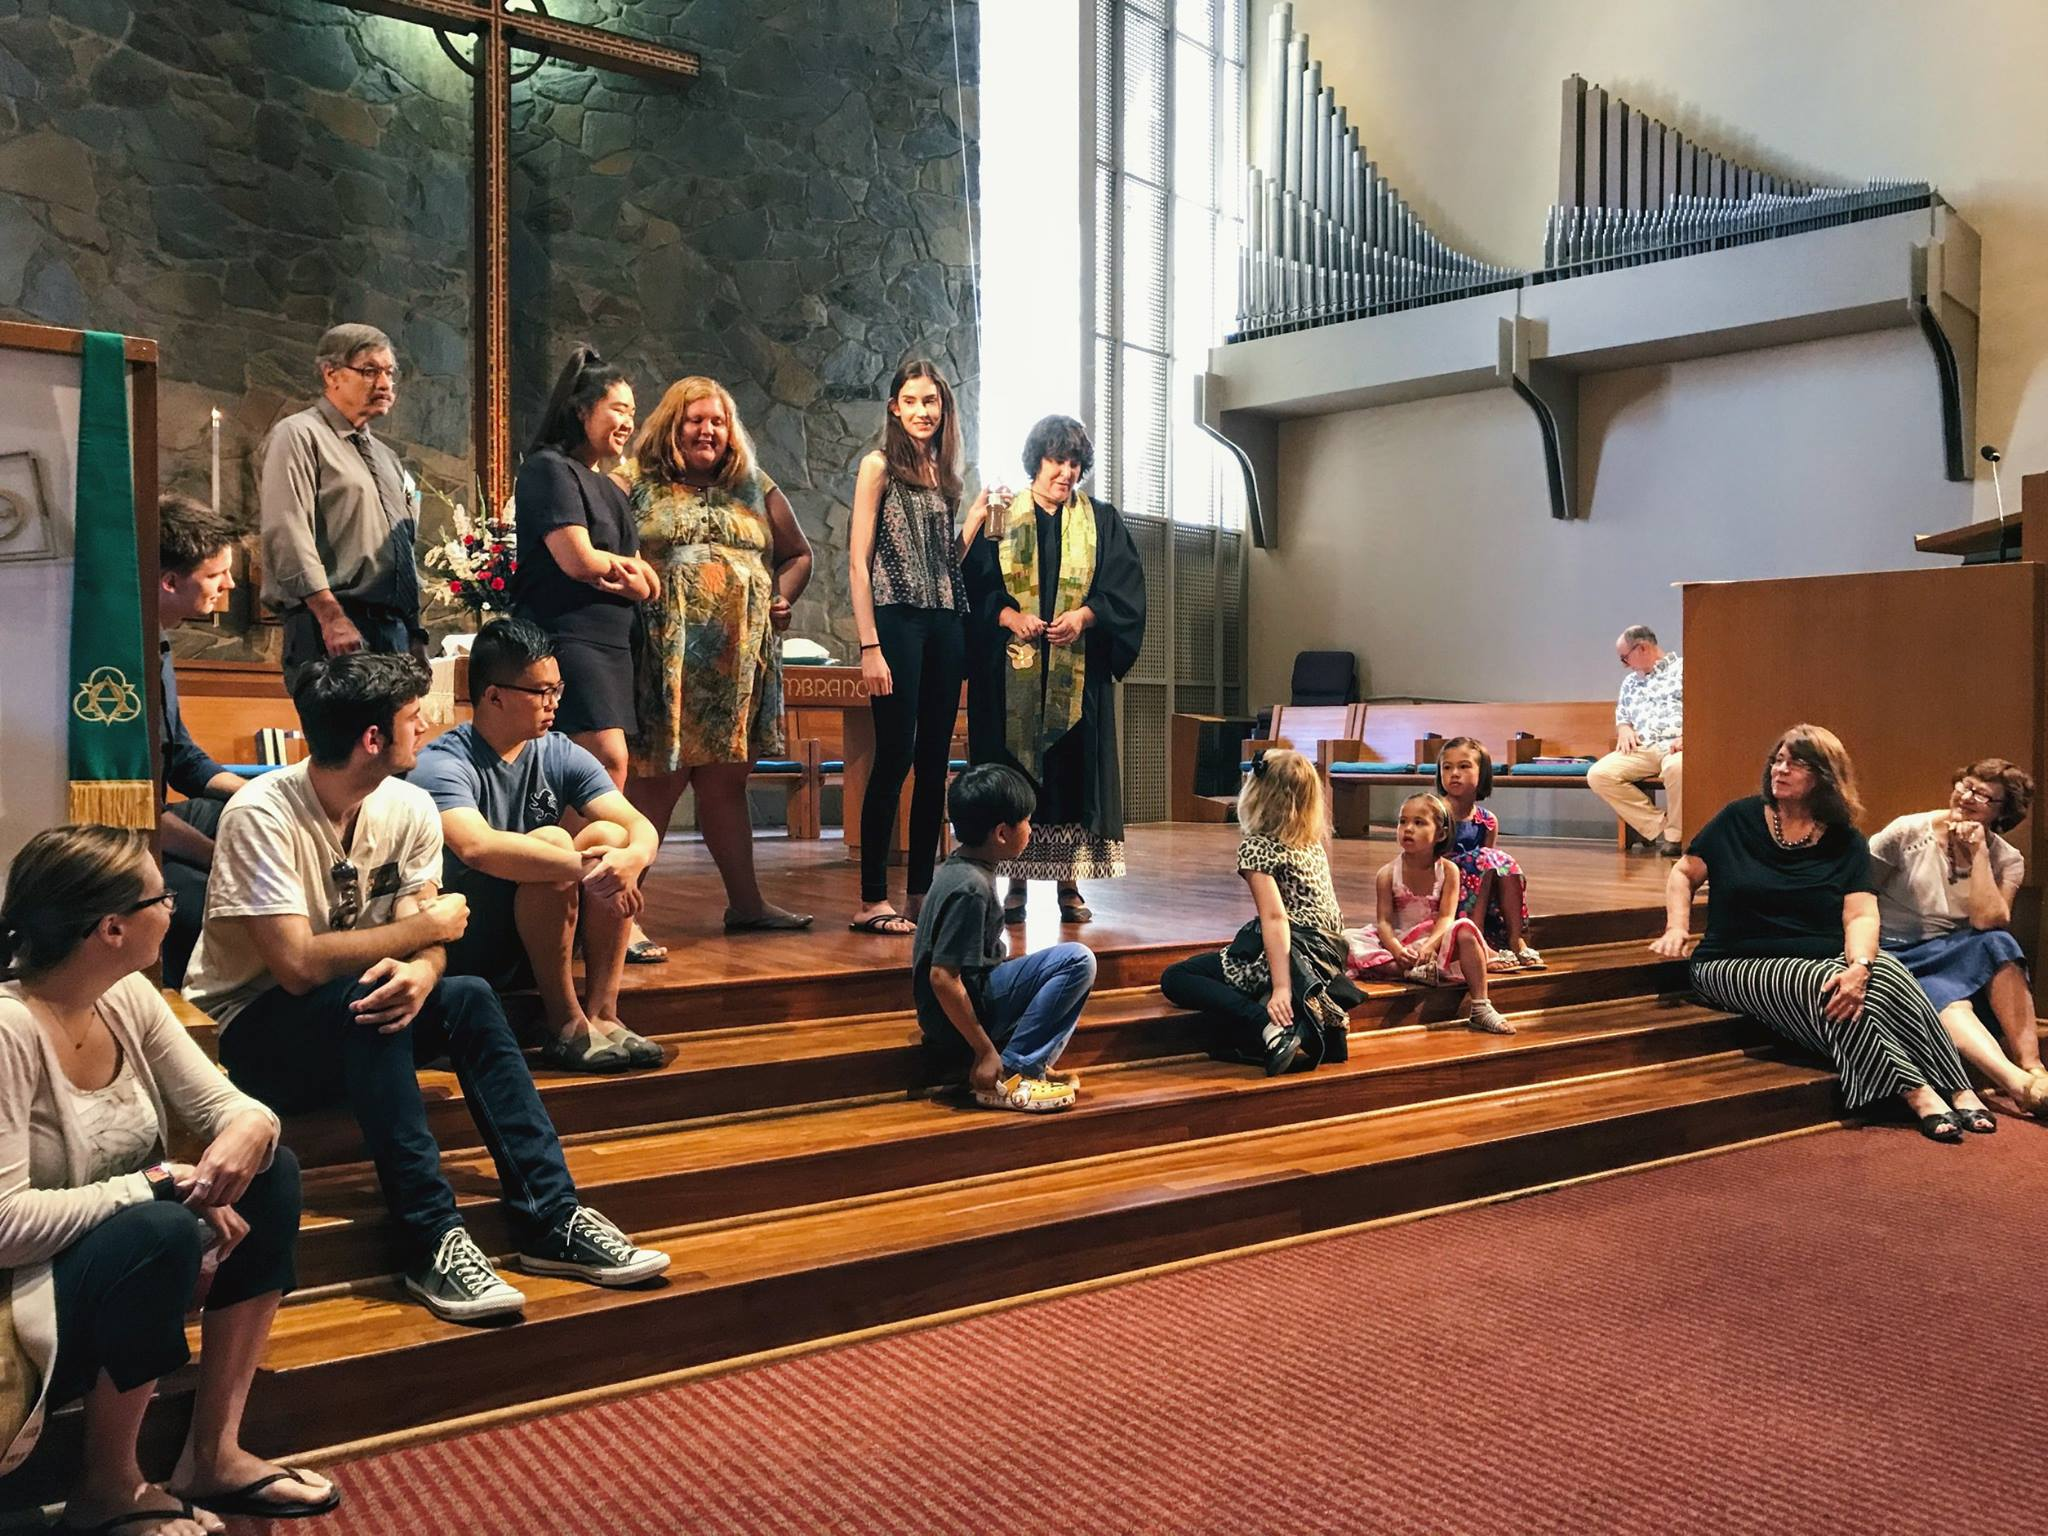 claremont-presbyterian-church-youth-childrens-service-2.jpg